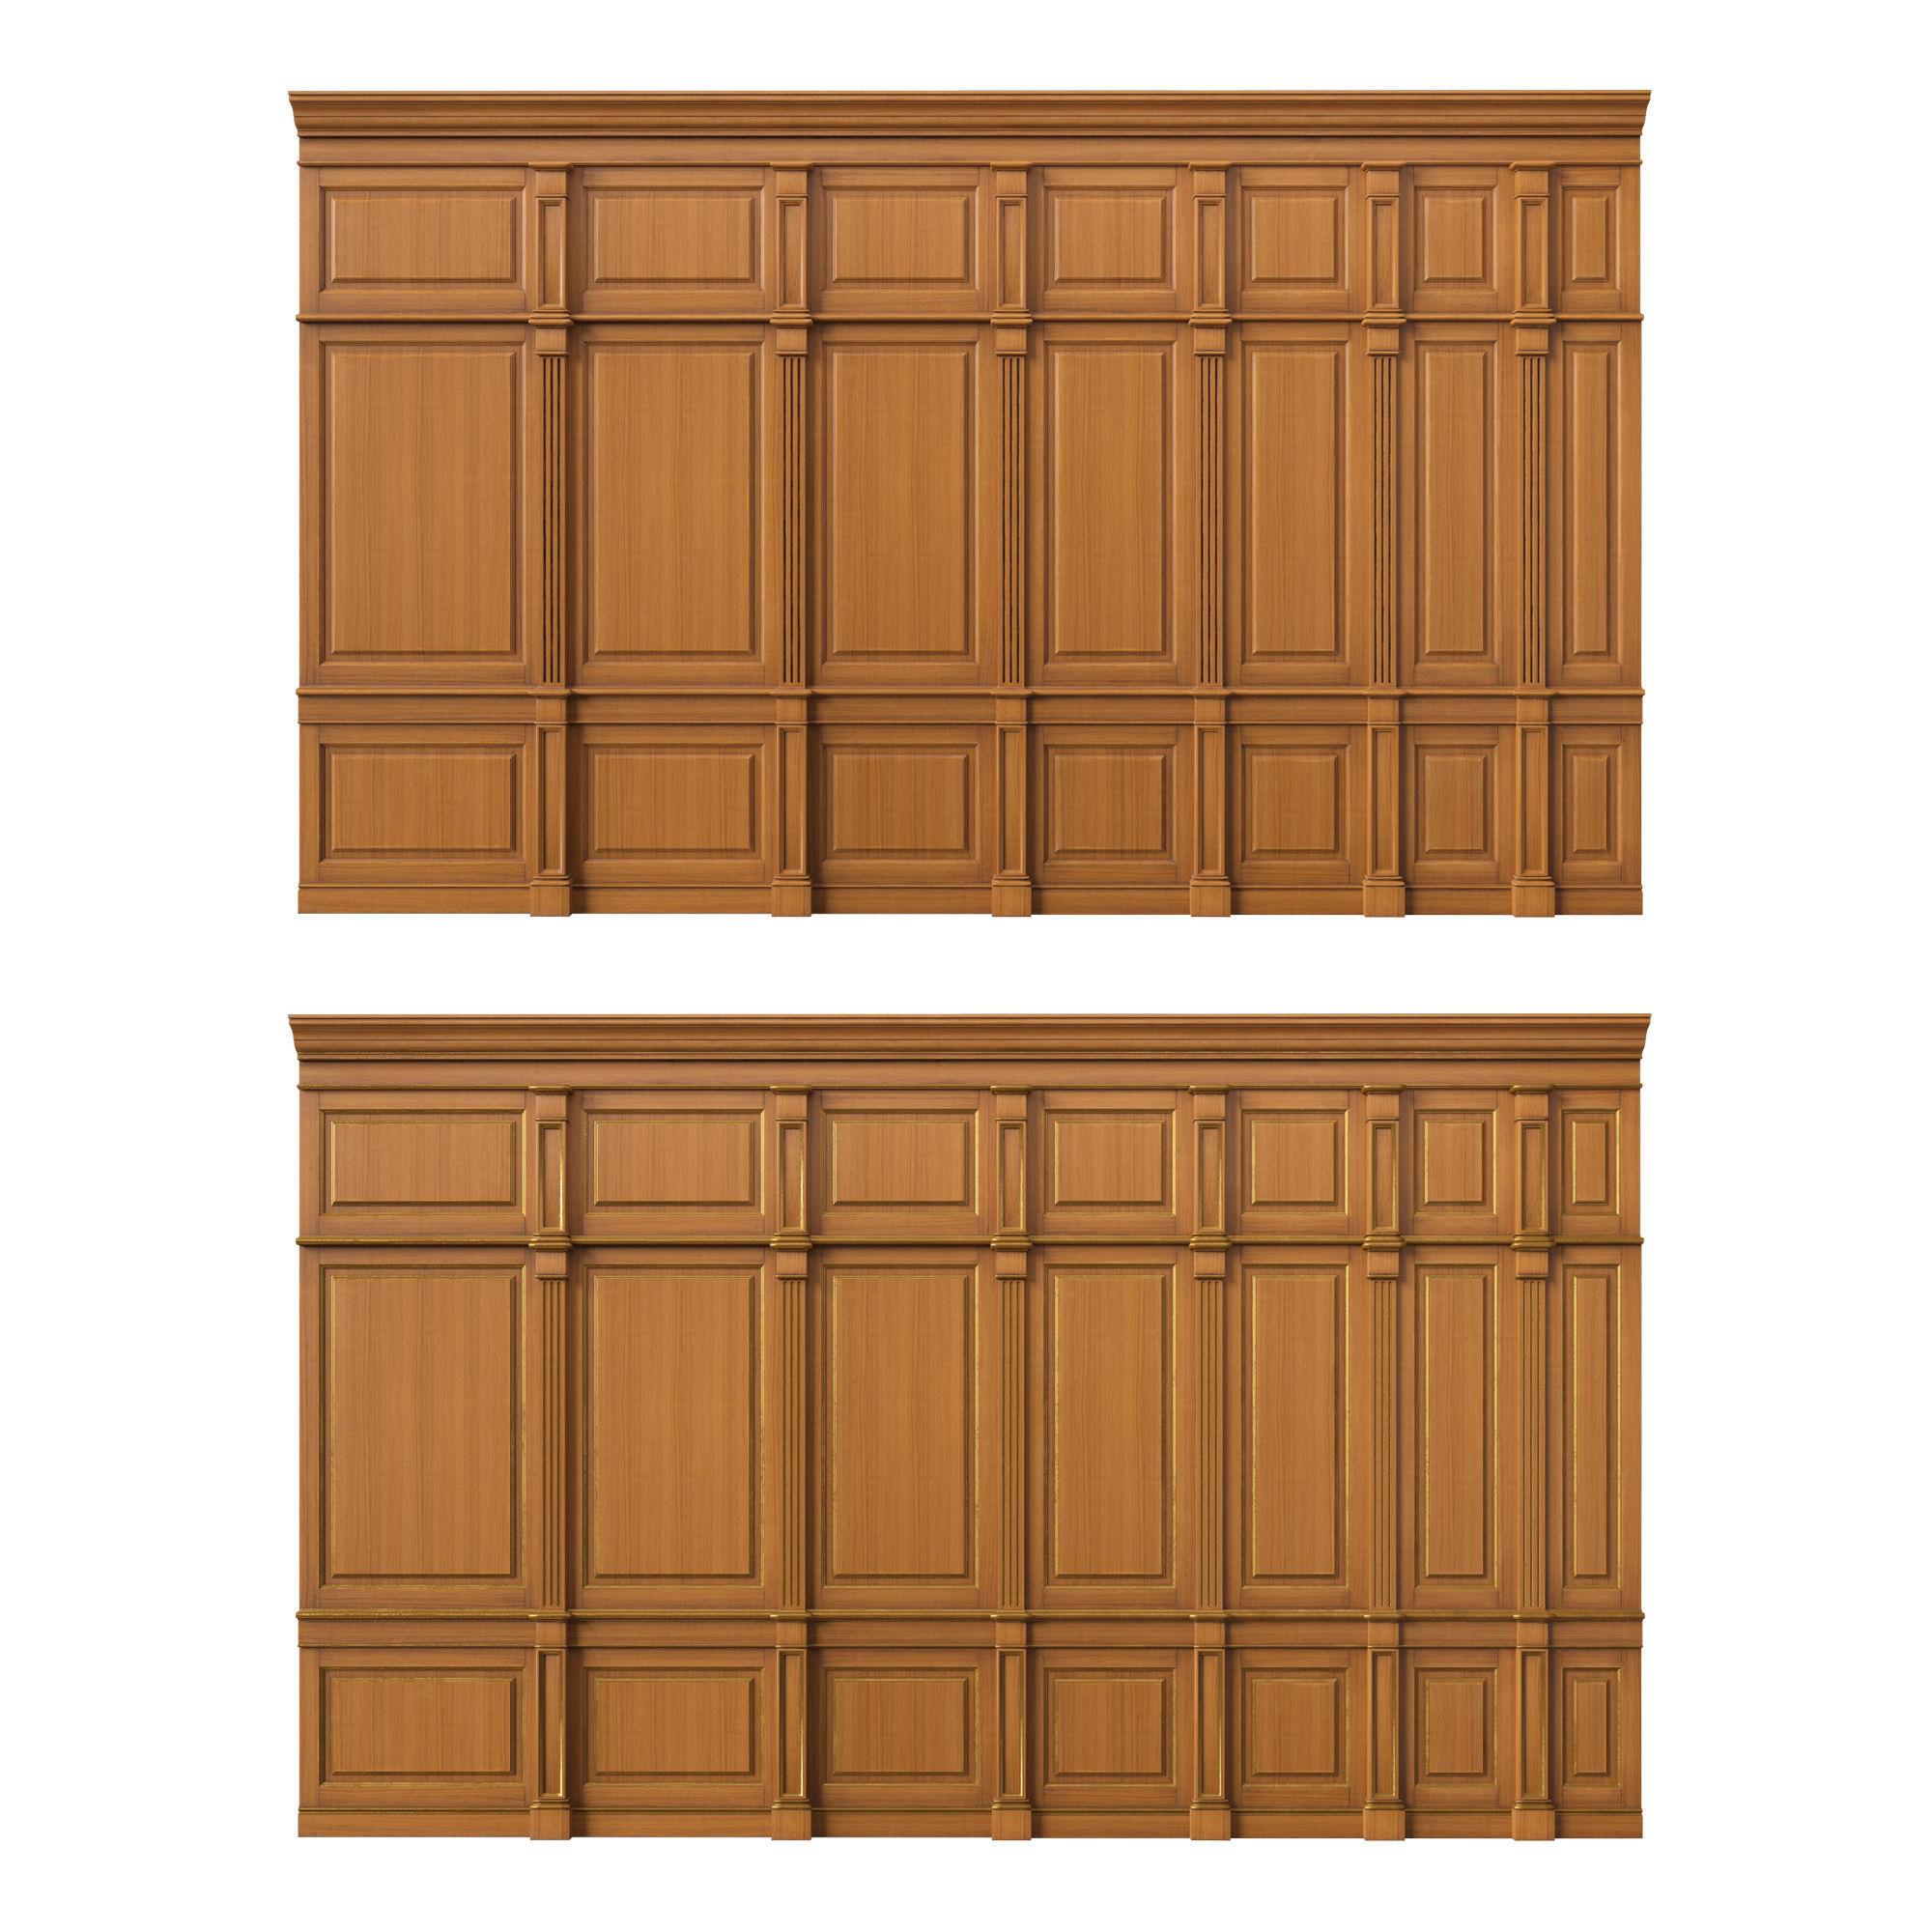 Wooden panel 03